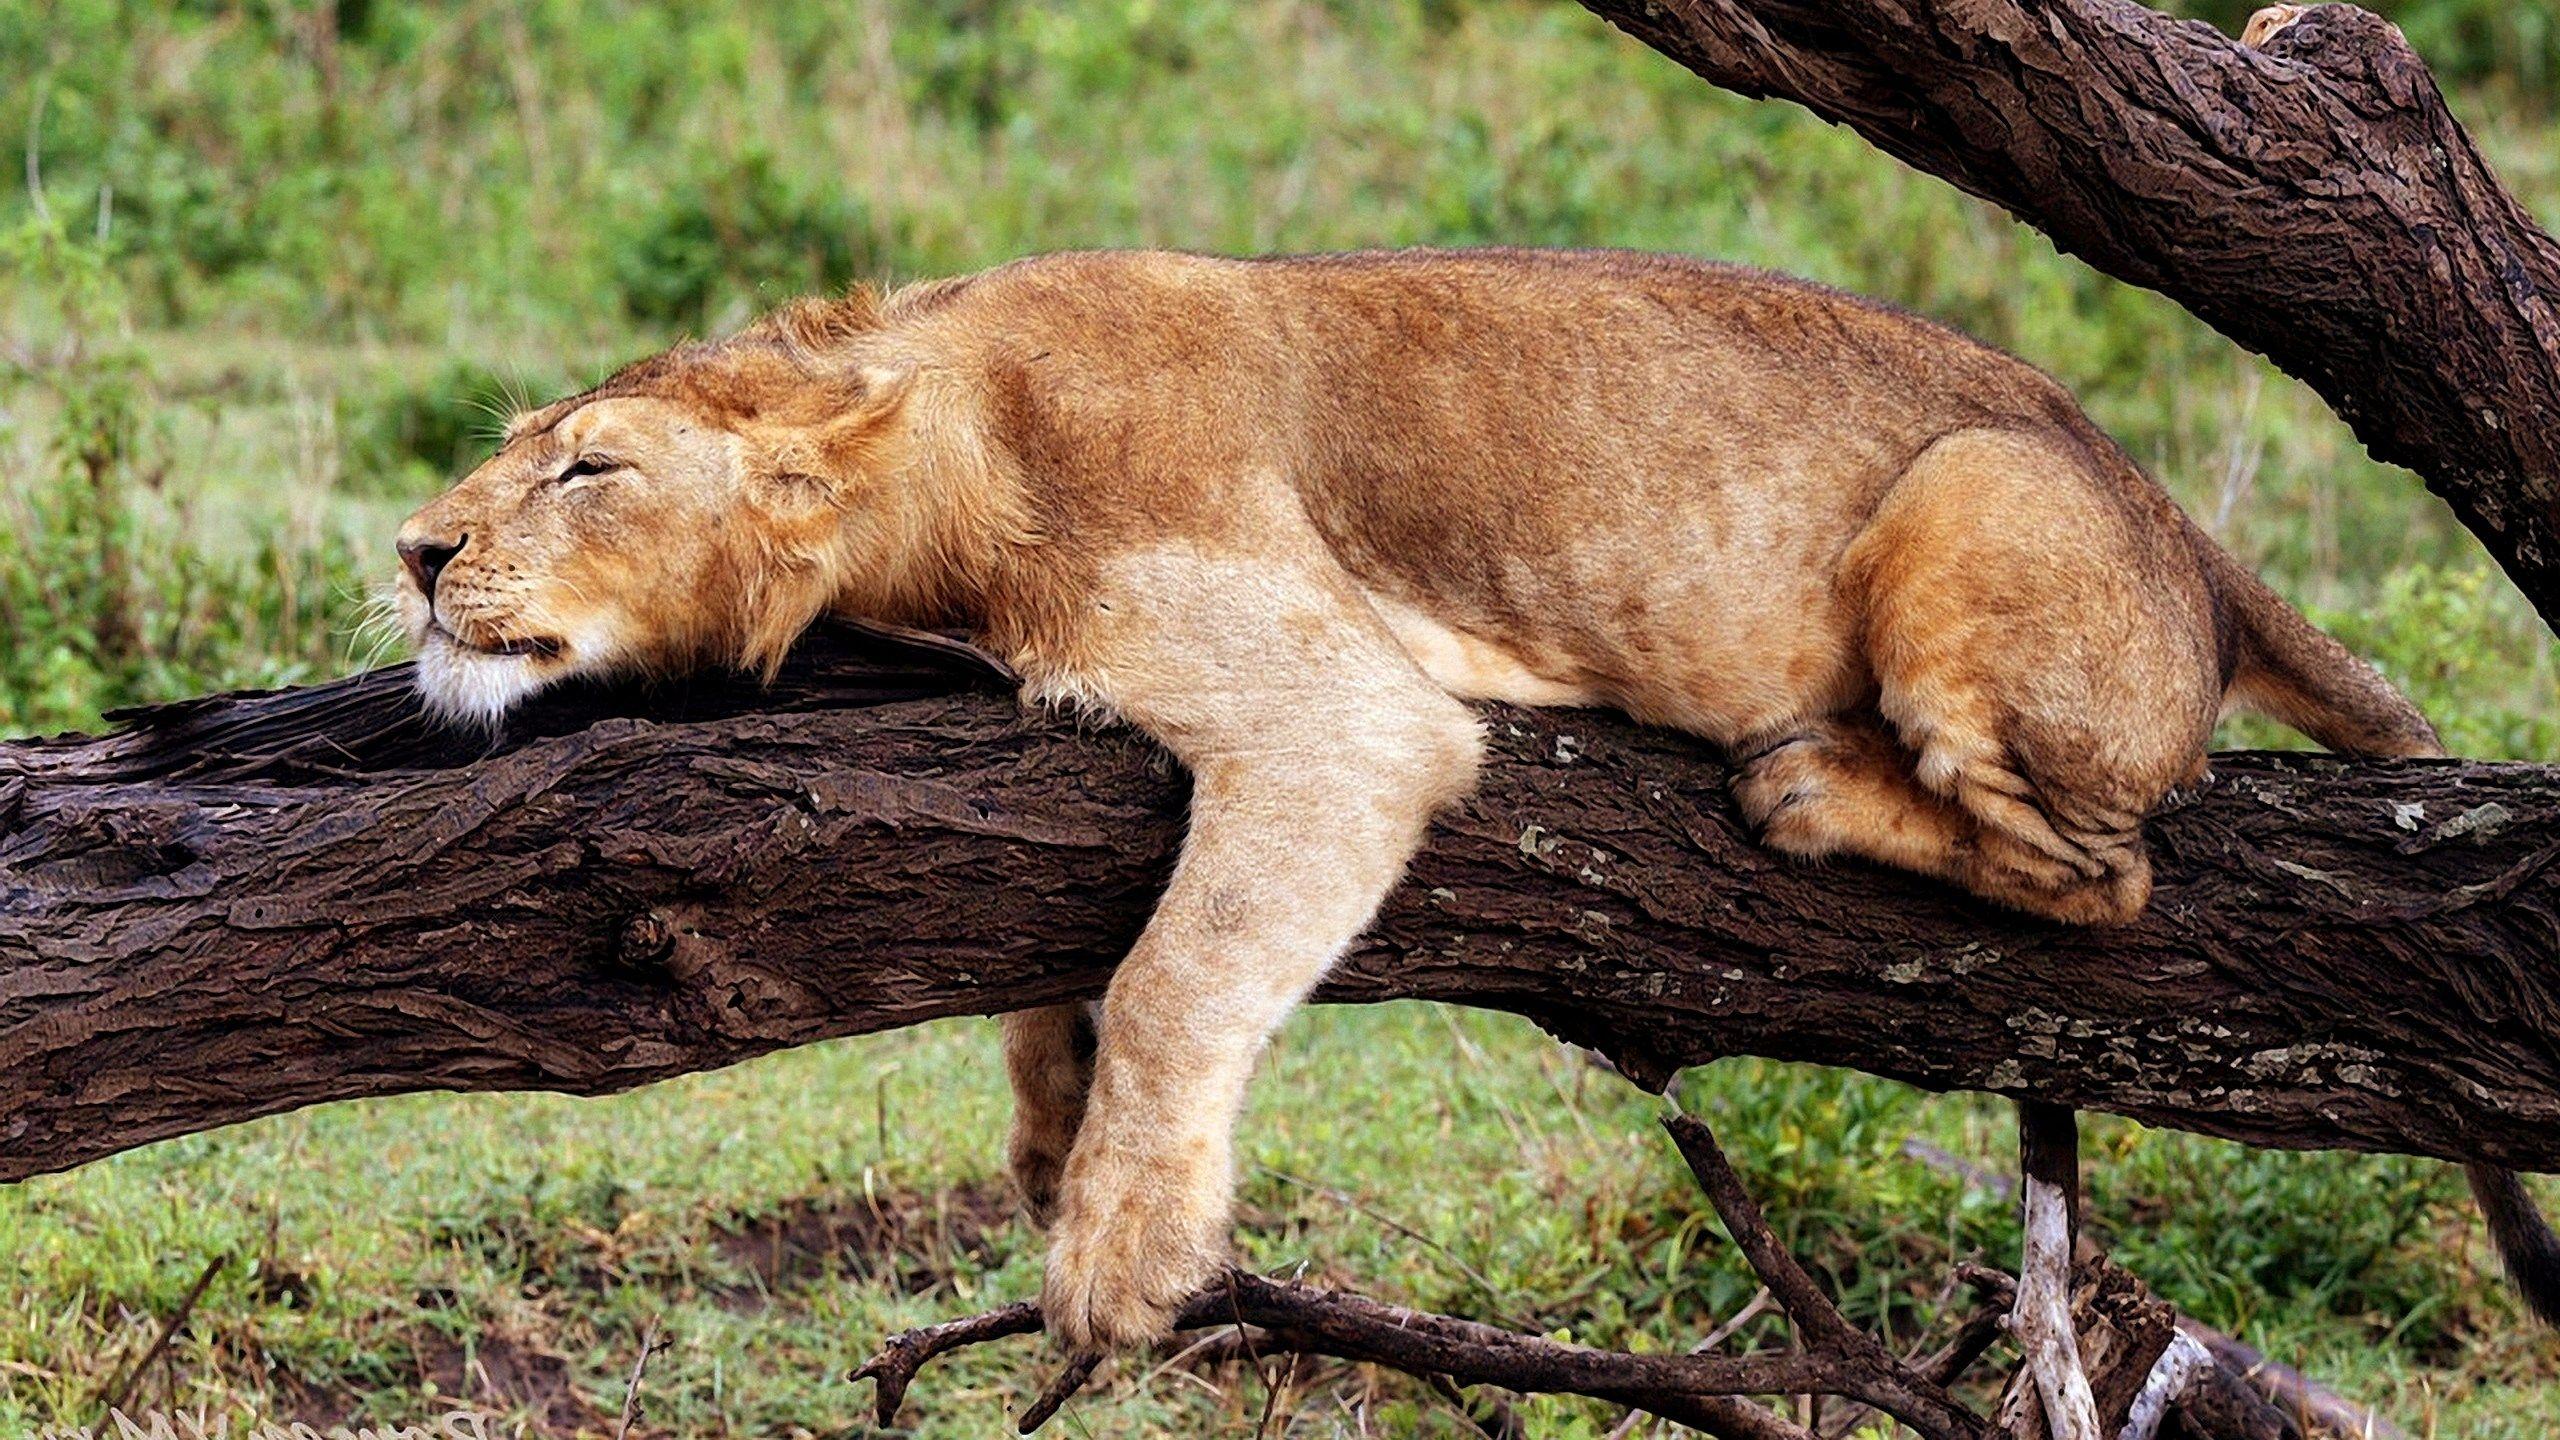 sleeping lioness picture | ololoshenka | Pinterest